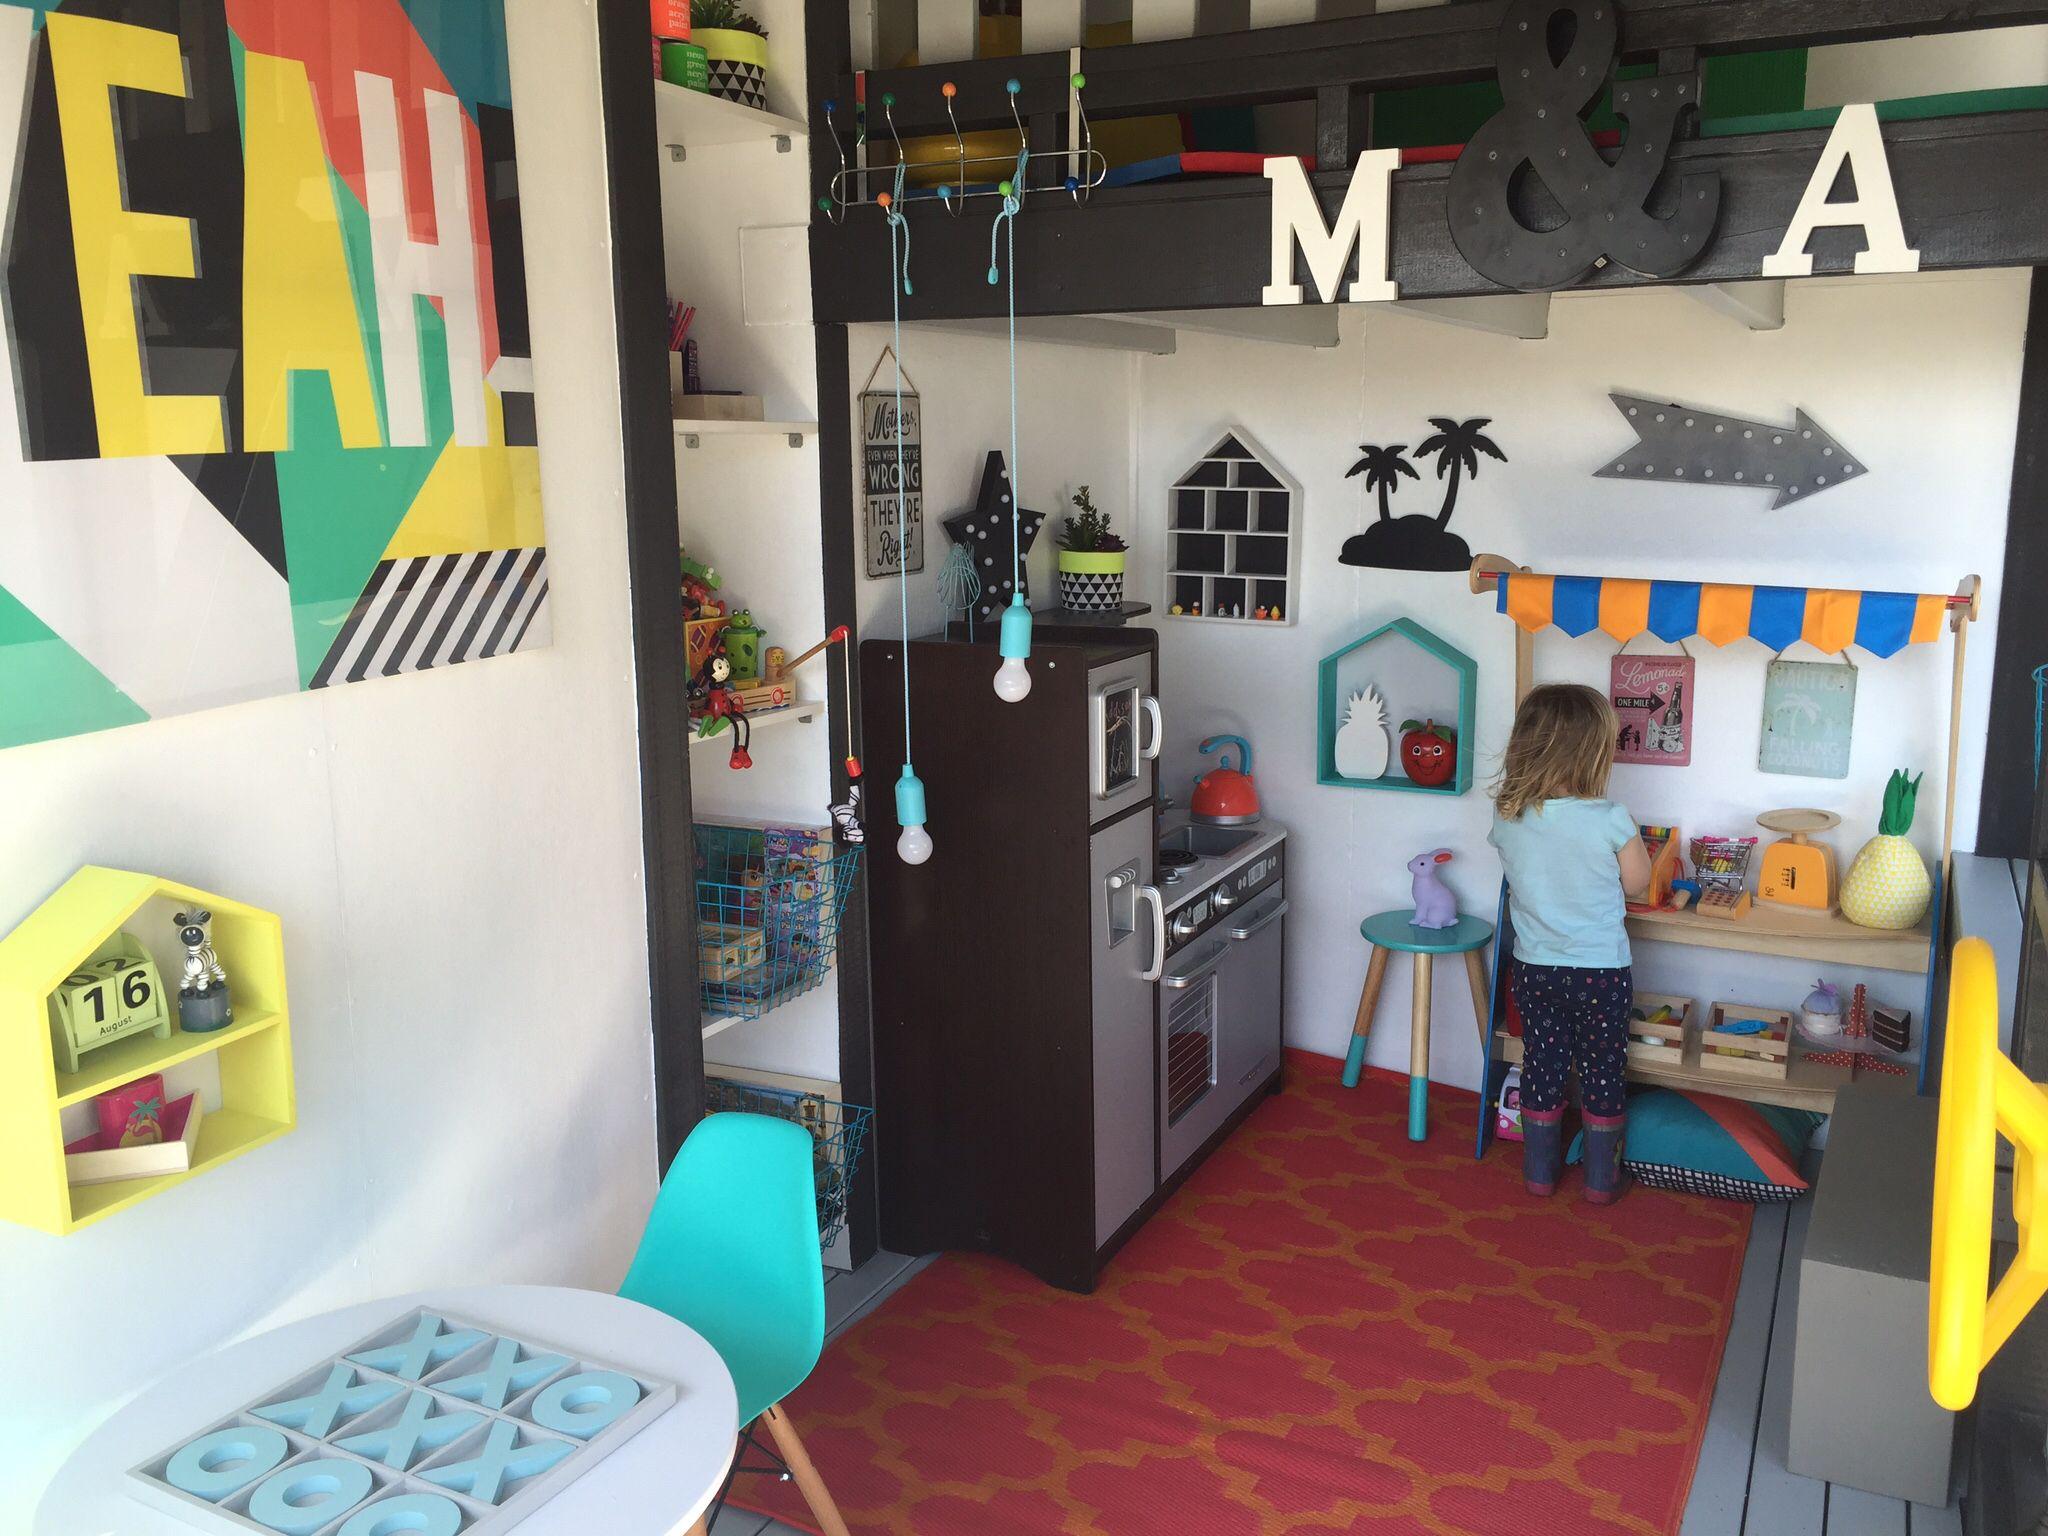 Kids cubby house interior Got to love Kmart